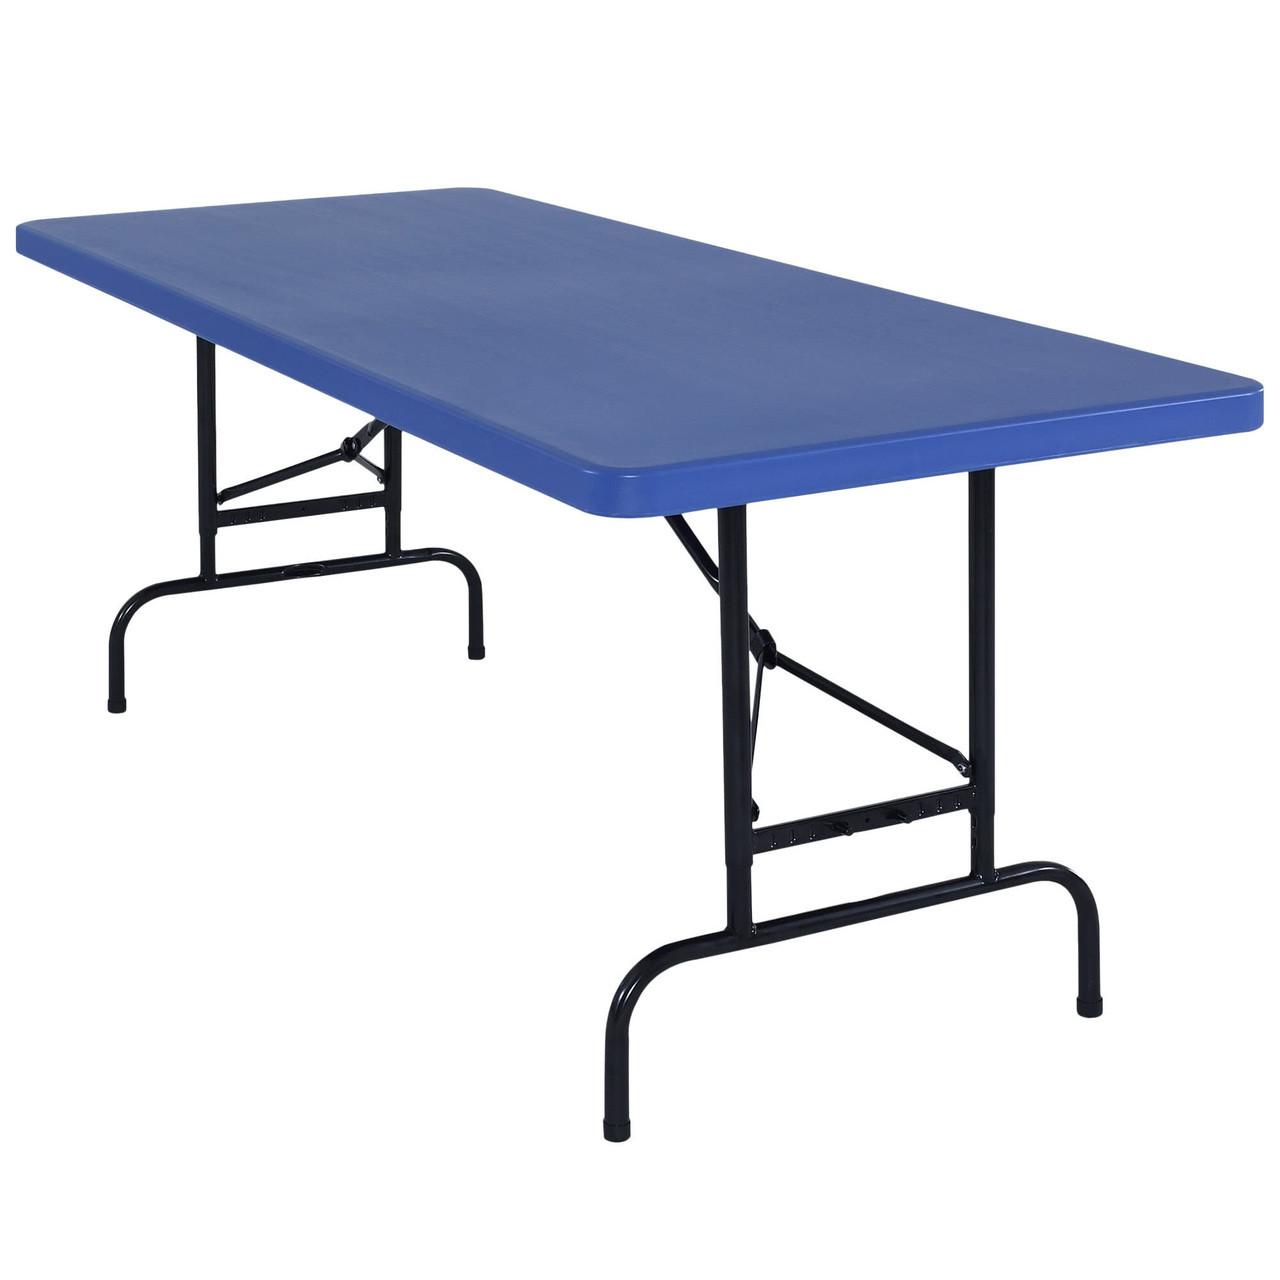 Body Builder 30w X 72l 6 Ft Blue Adjustable Height Plastic